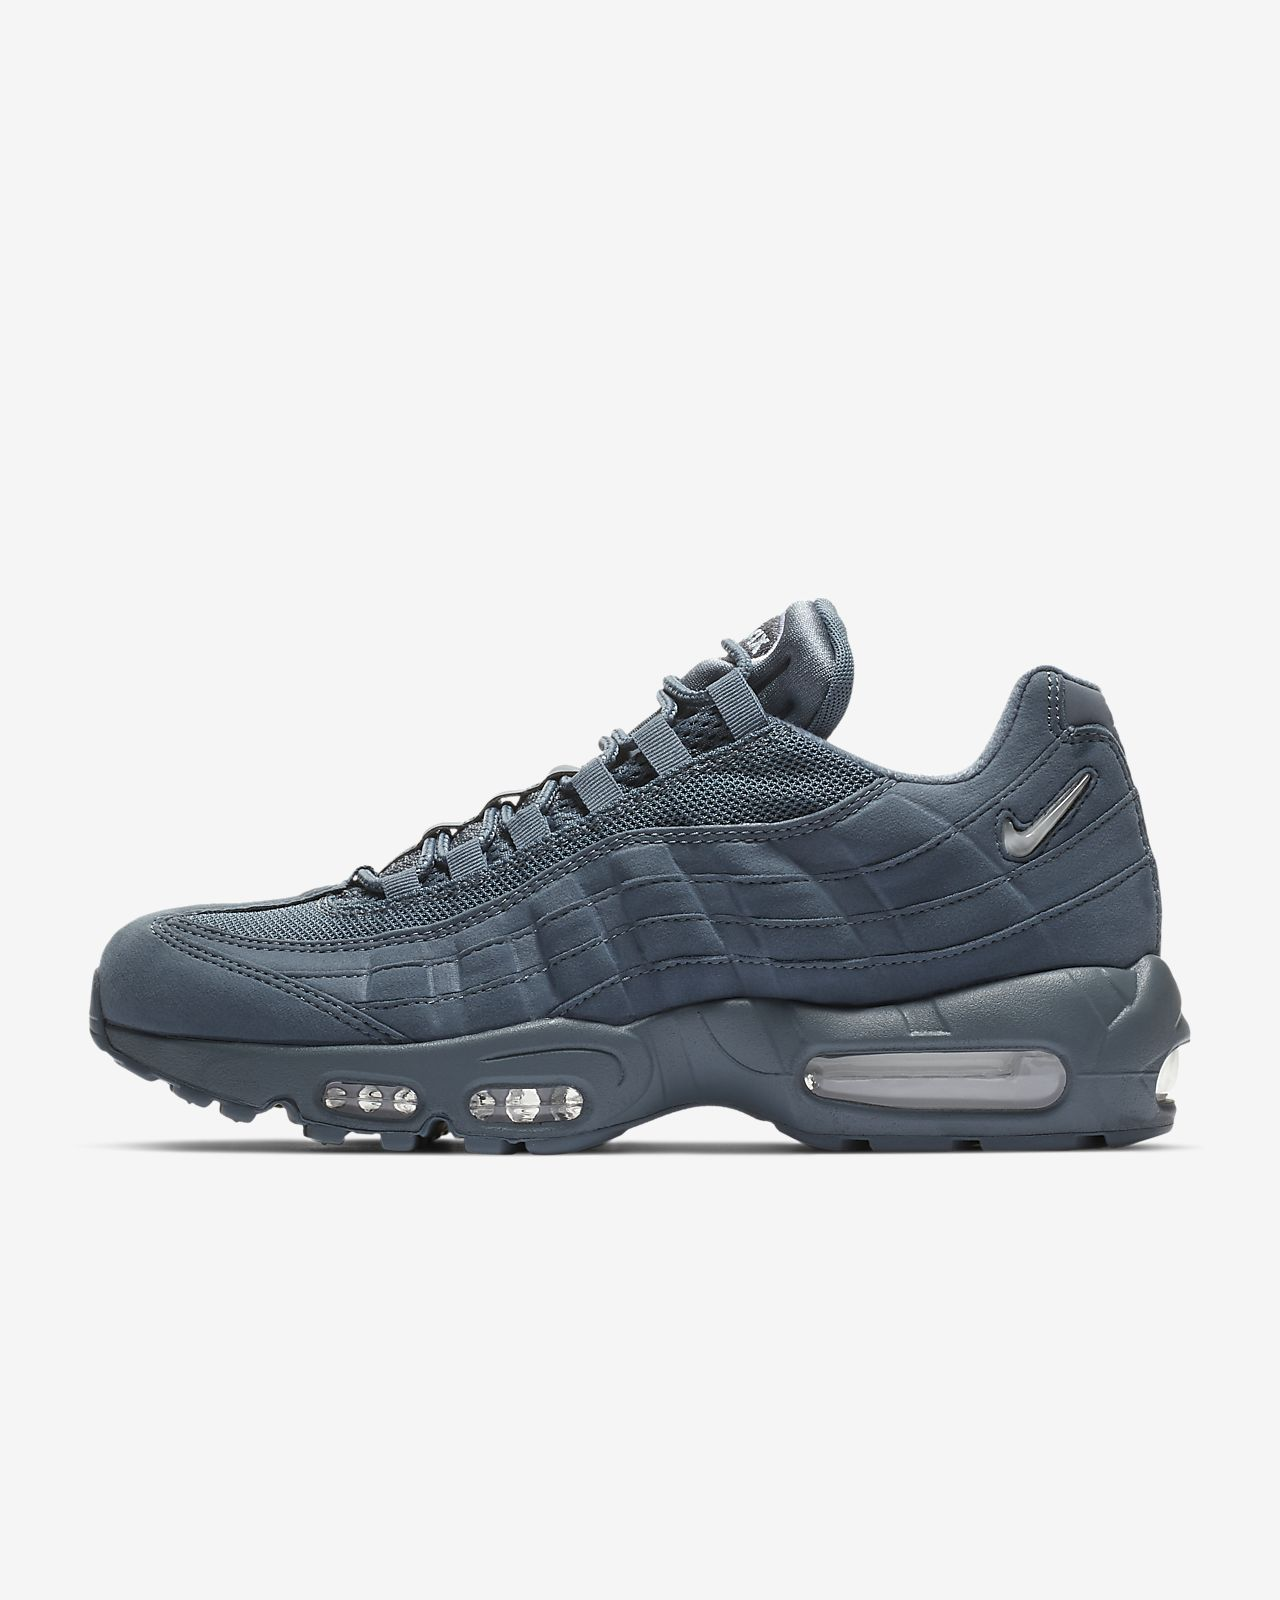 2fa0c9a70234 Nike Air Max 95 SC Men s Shoe. Nike.com CA